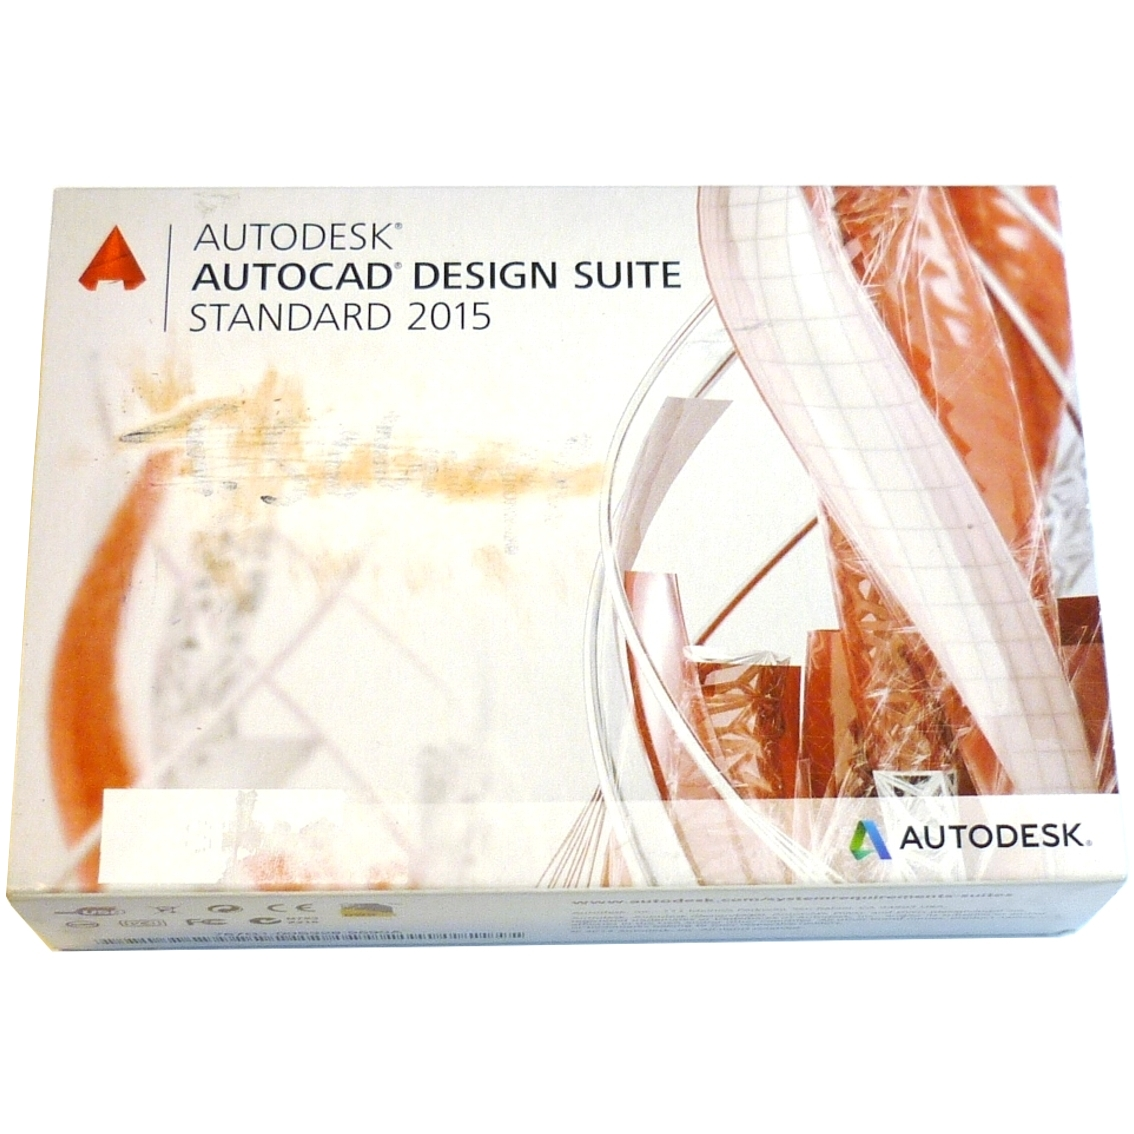 autodesk autocad design suite standard 2015 dss 2015 en usb mit rechnung. Black Bedroom Furniture Sets. Home Design Ideas